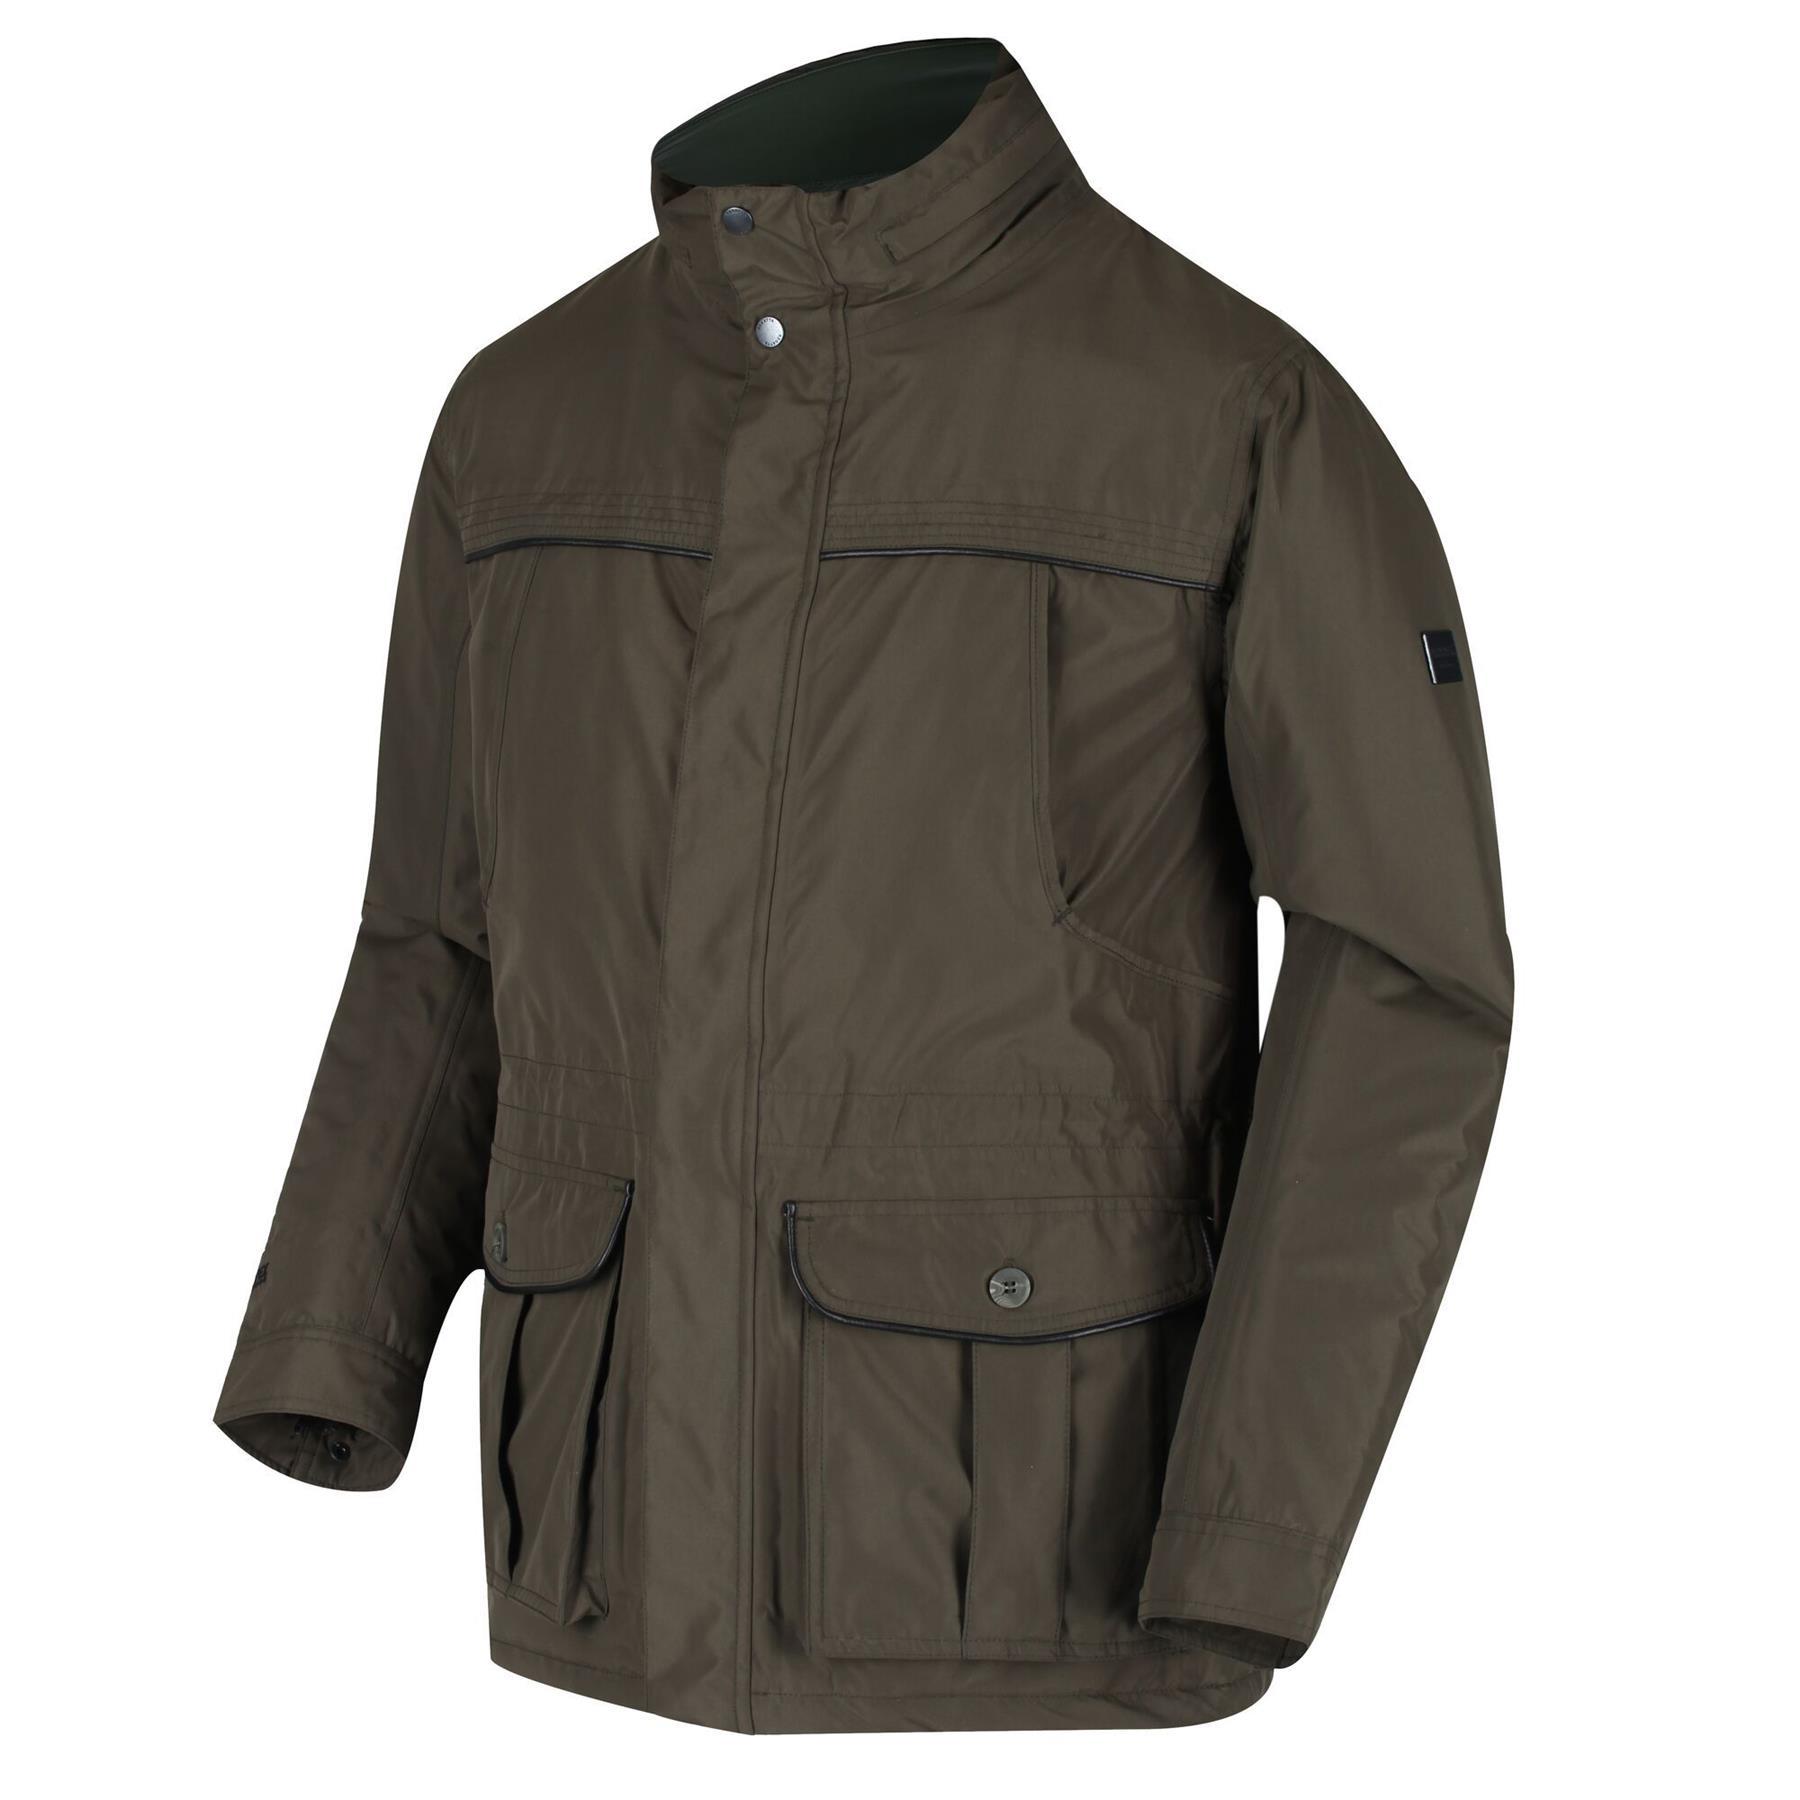 miniatuur 11 - Regatta Mens Rawson Waterproof Breathable Insulated Jacket Coat